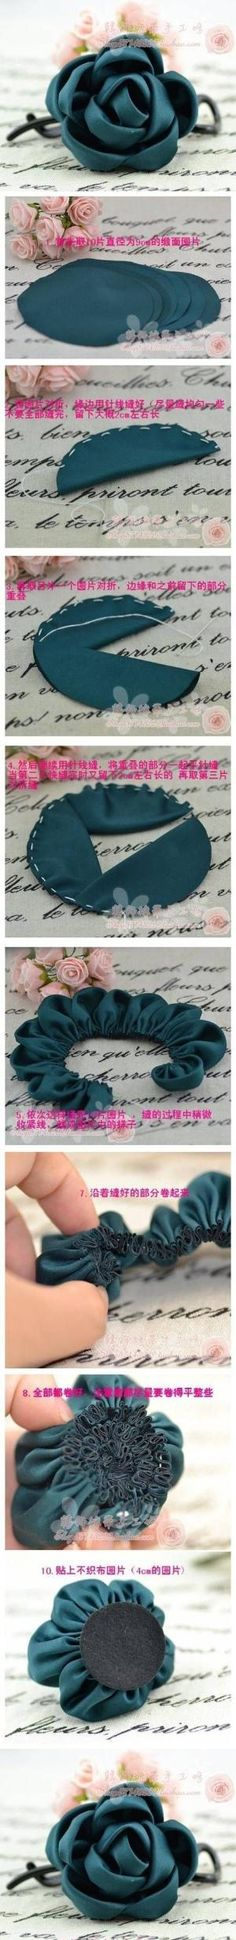 DIY Easy Fabric Roses by NataliaOblitasV